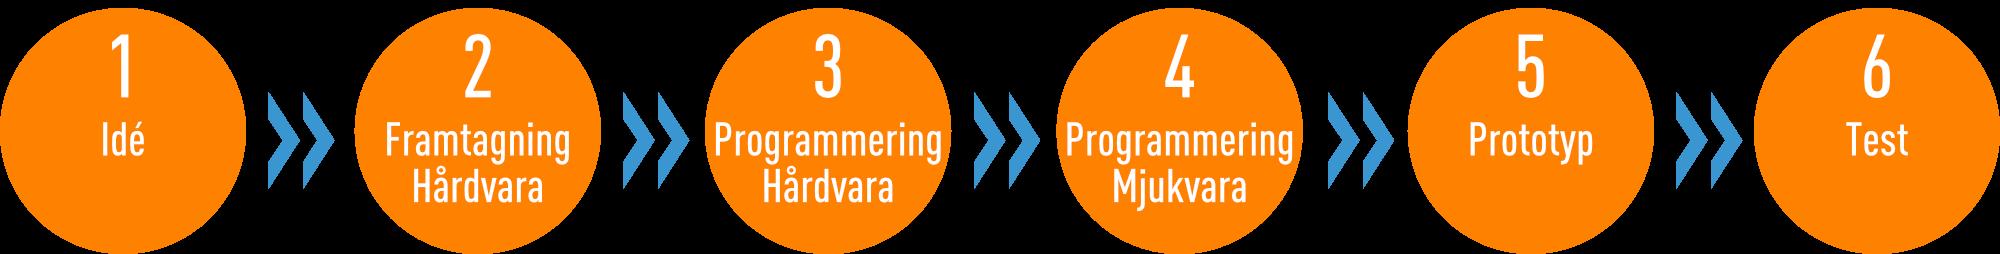 Utveckla IoT Prototyper